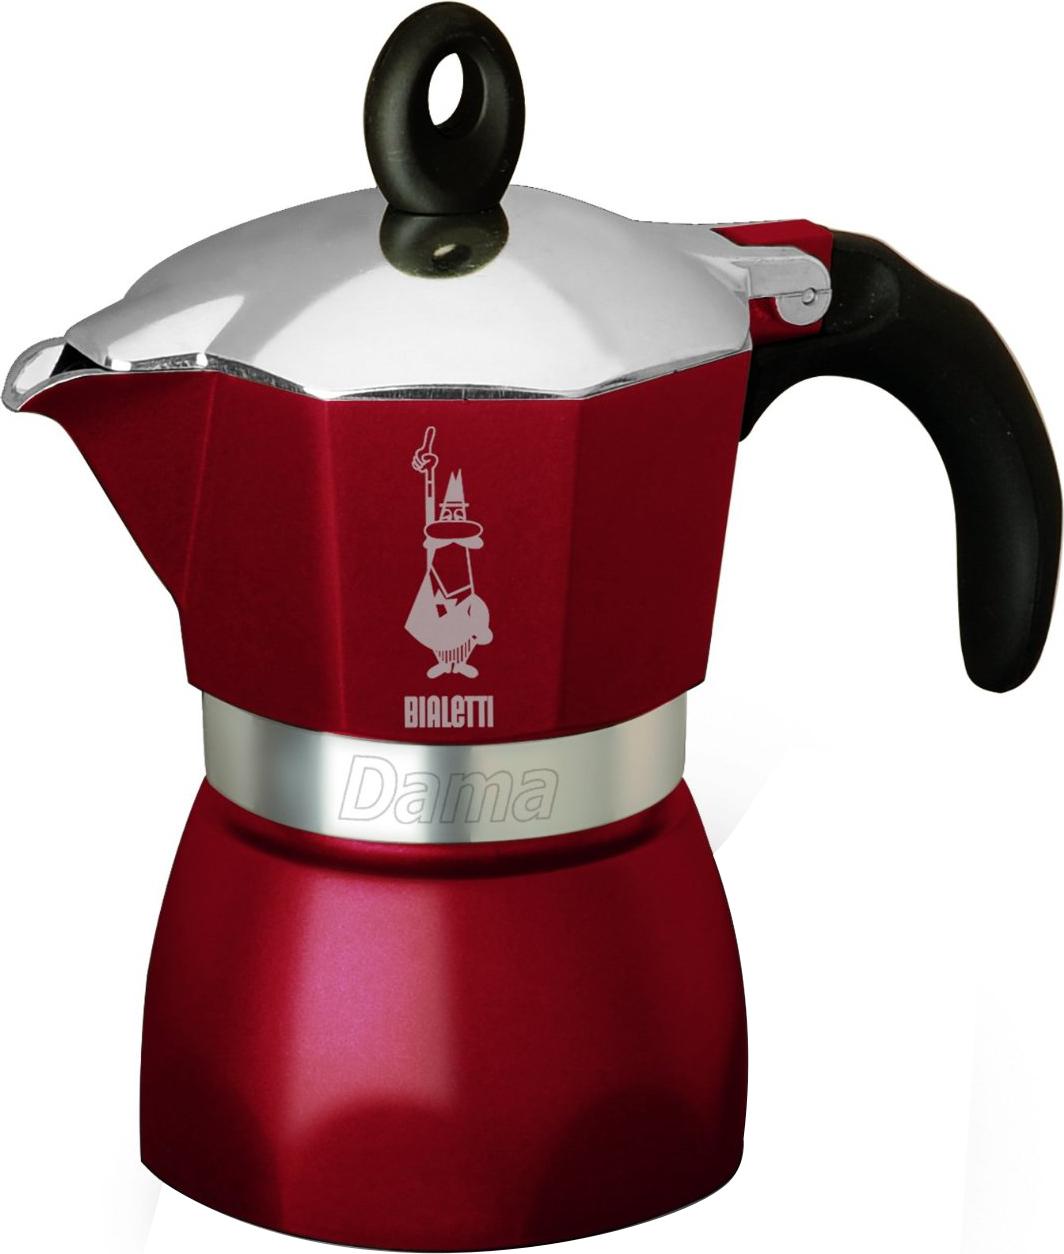 BIALETTI DAMA GLAMOUR CAFFETTIERA 3 TZ ROSSA